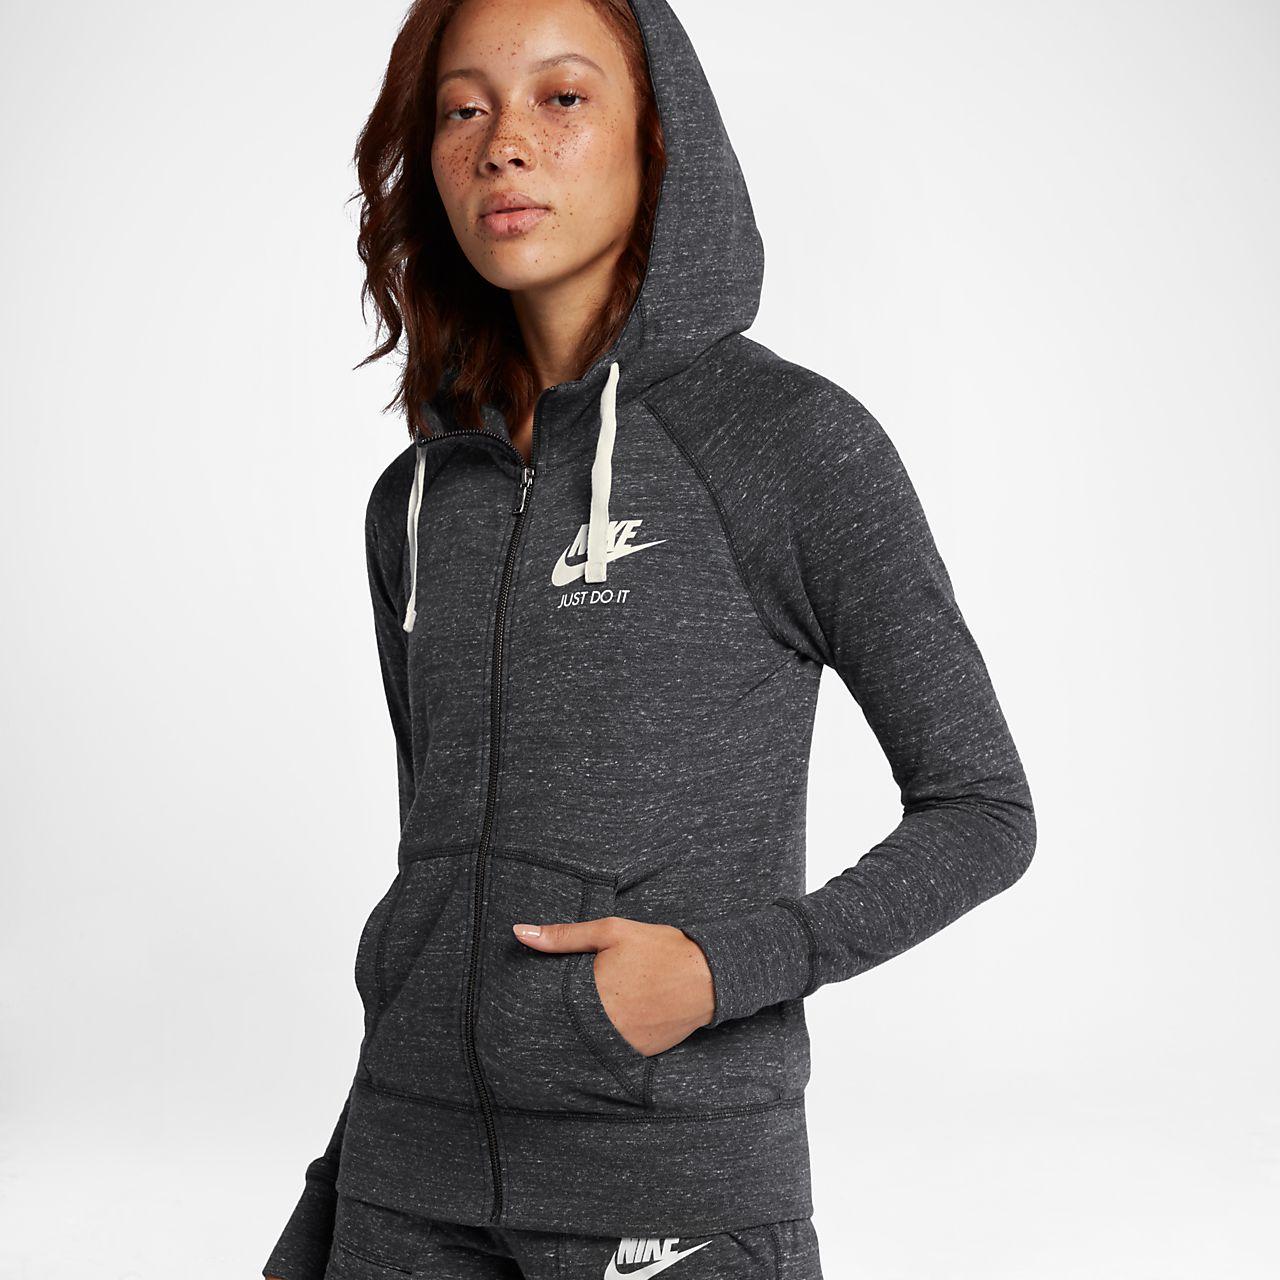 46a44b888bd7 Nike Sportswear Gym Vintage Women s Full-Zip Hoodie. Nike.com AU